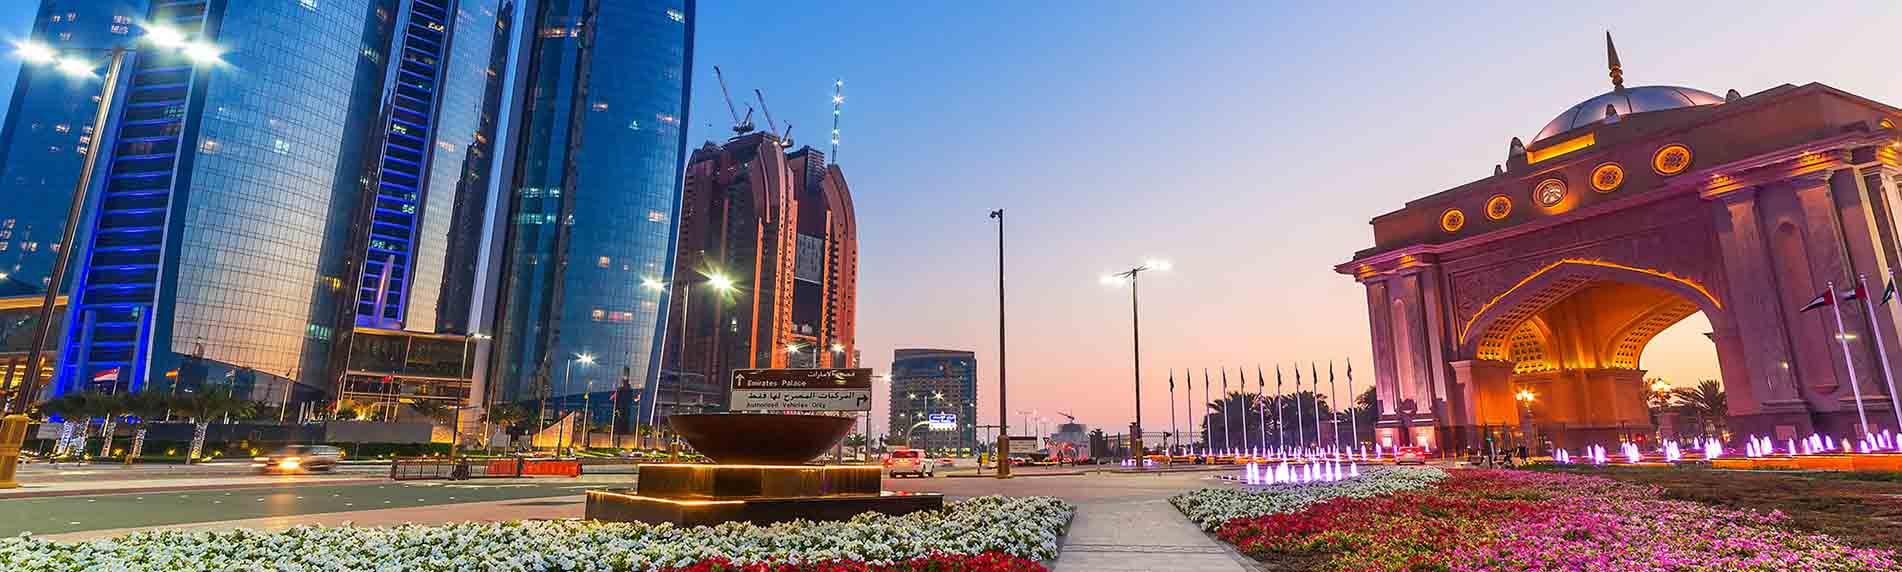 Explore Dubai and Abu Dhabi 6 nights